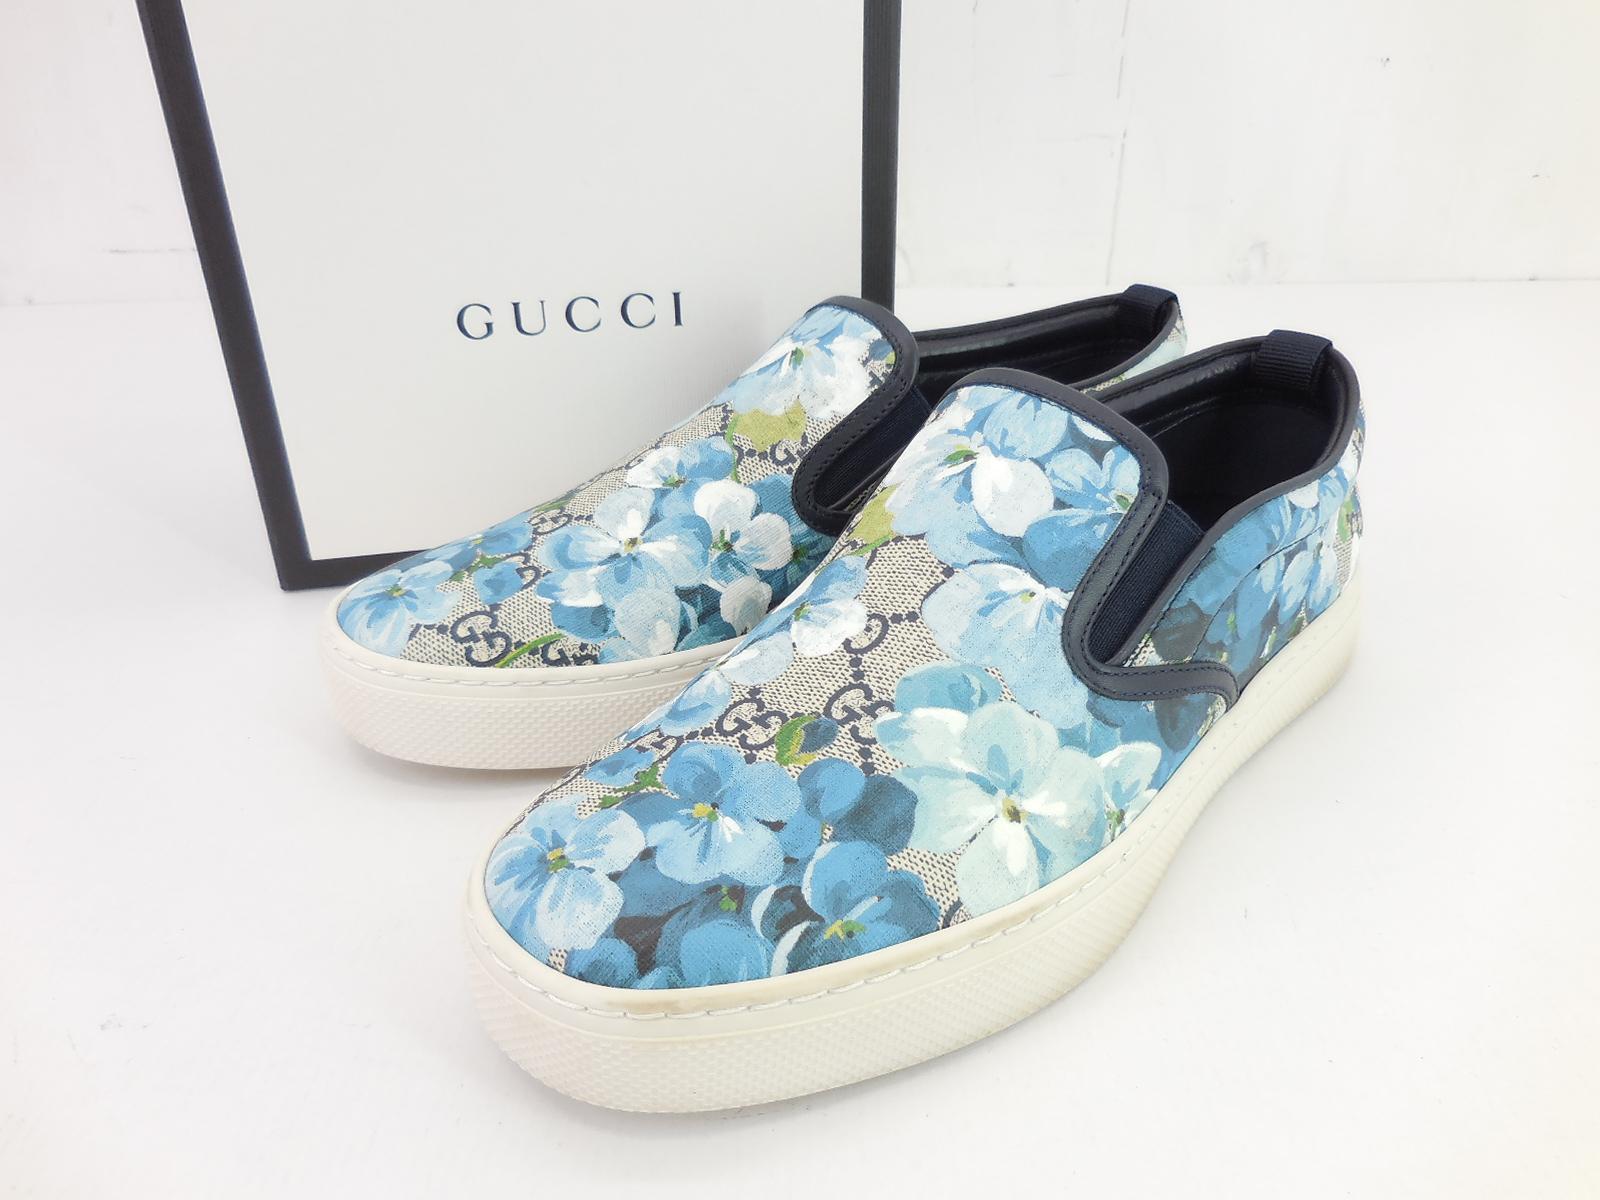 GUCCI 546152 フローラルスリッポン size:7.5(JP26.5cm) グッチ GGスプリーム スニーカー シューズ 靴 ブルー JSB鑑定済み